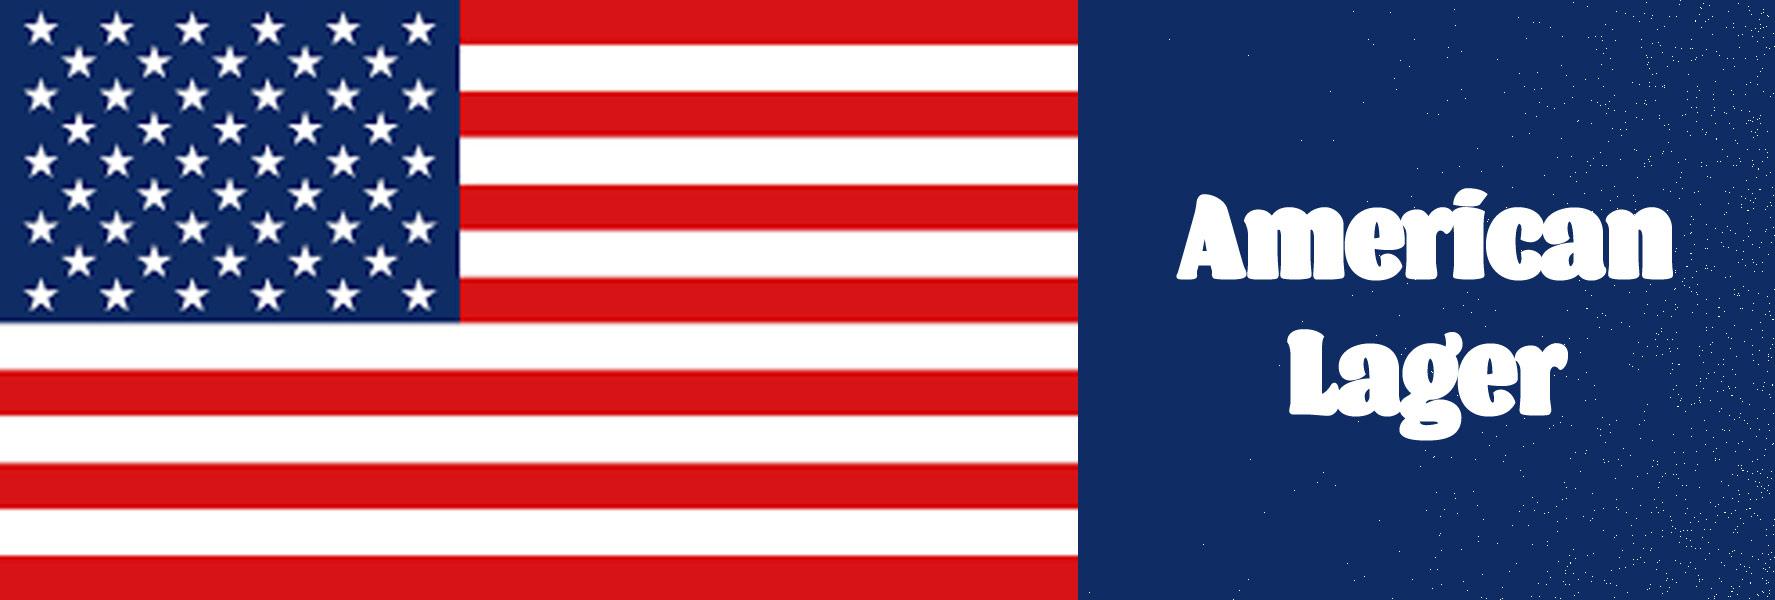 American Lager kaufen